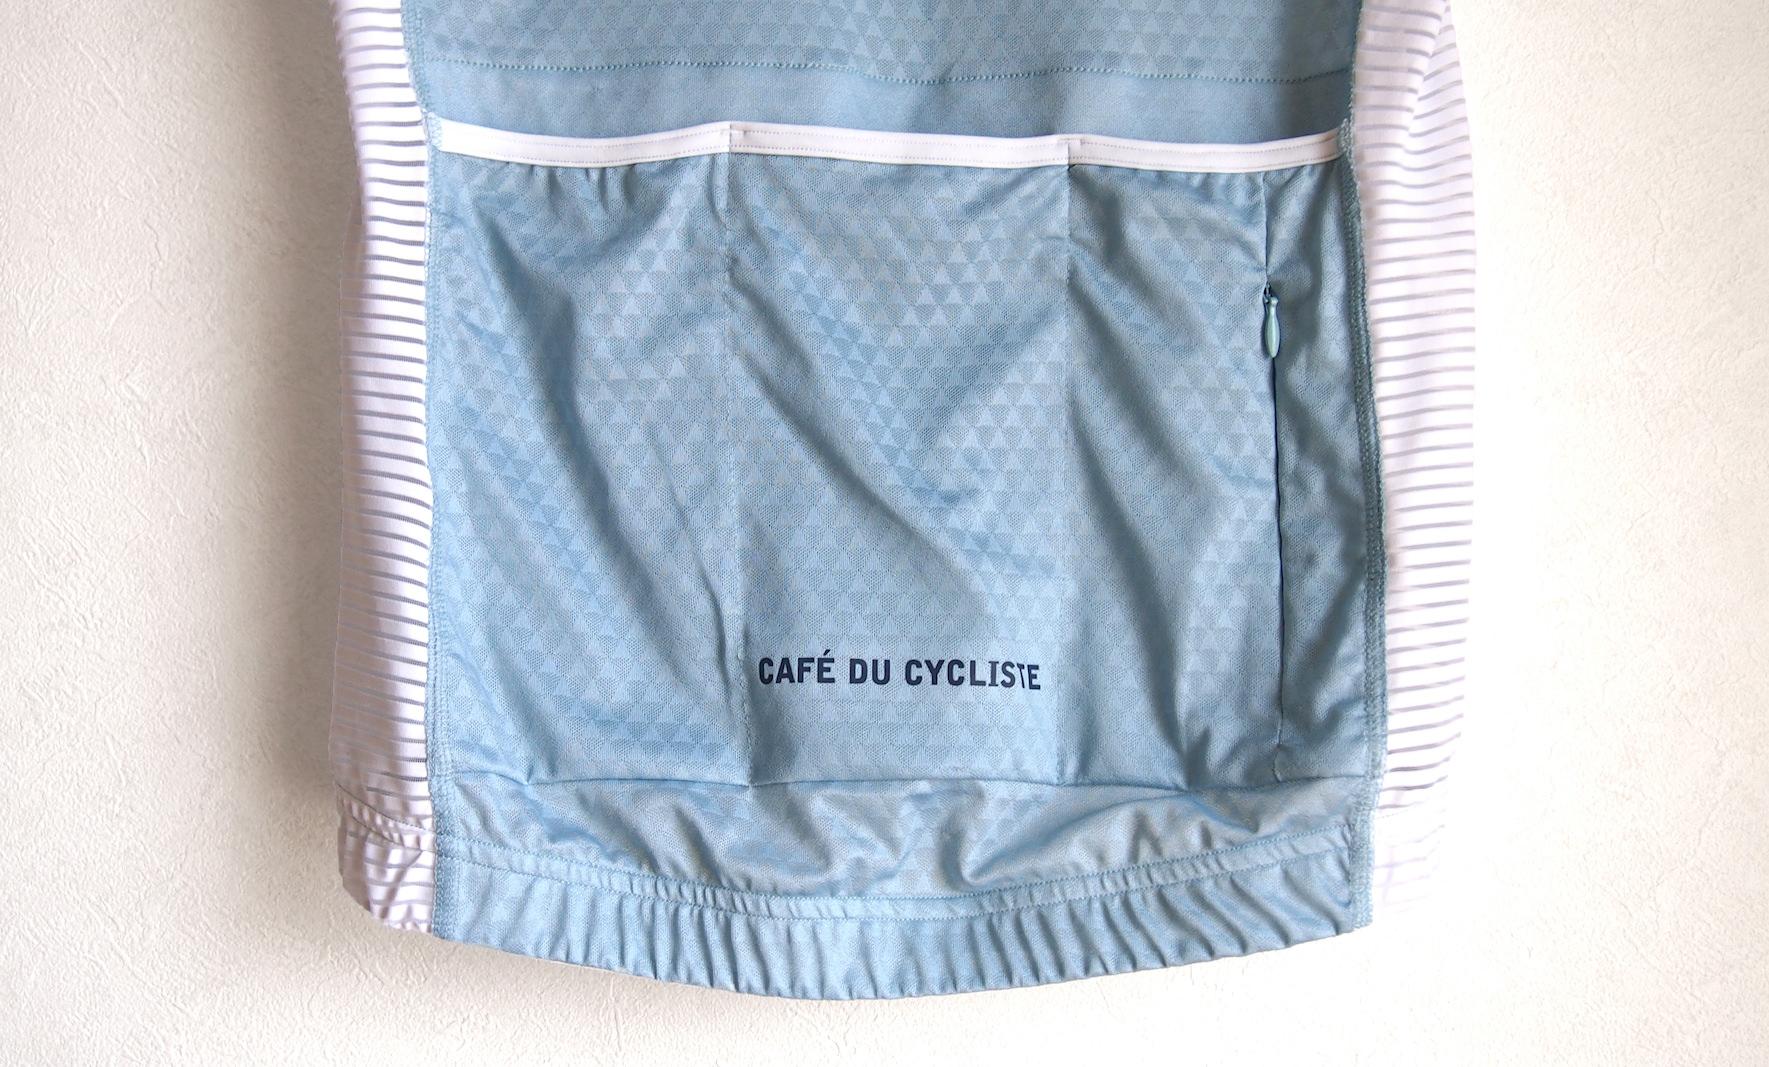 cafe du cycliste ジャージバックポケット